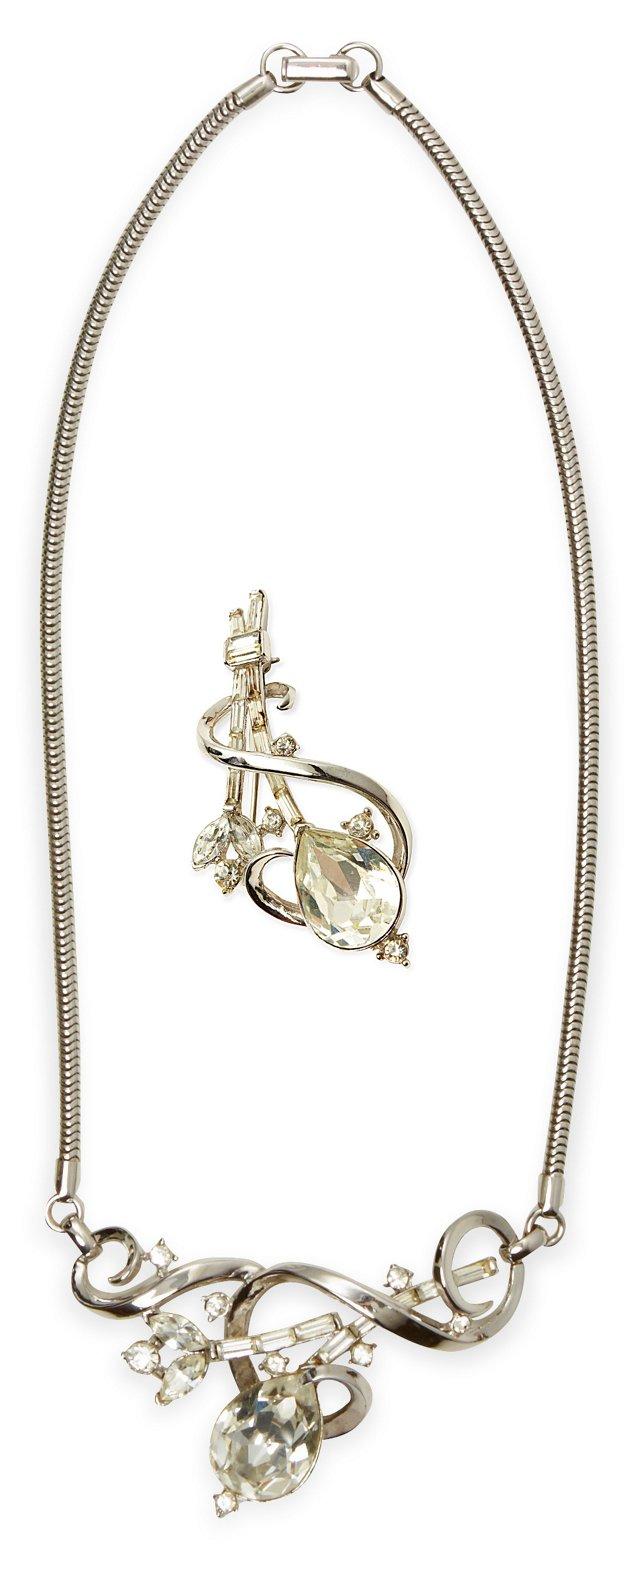 1960s Trifari Necklace & Pin Set